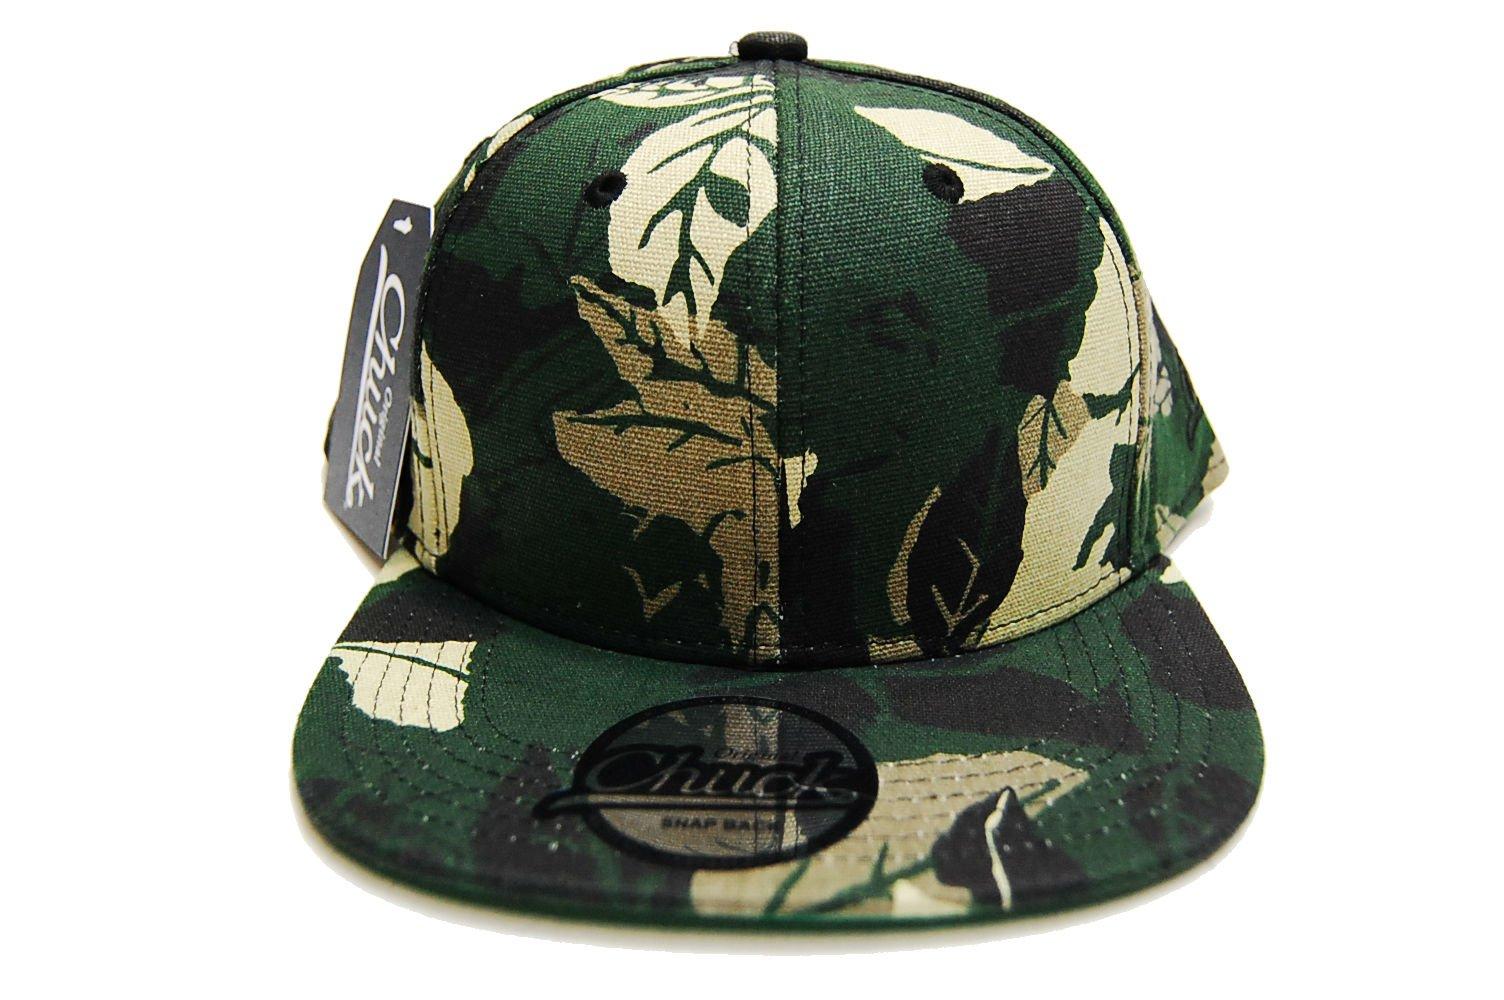 Chuck Originals Men's Camo Leopard Snake Skin Cap Hat Snapback (Multi)